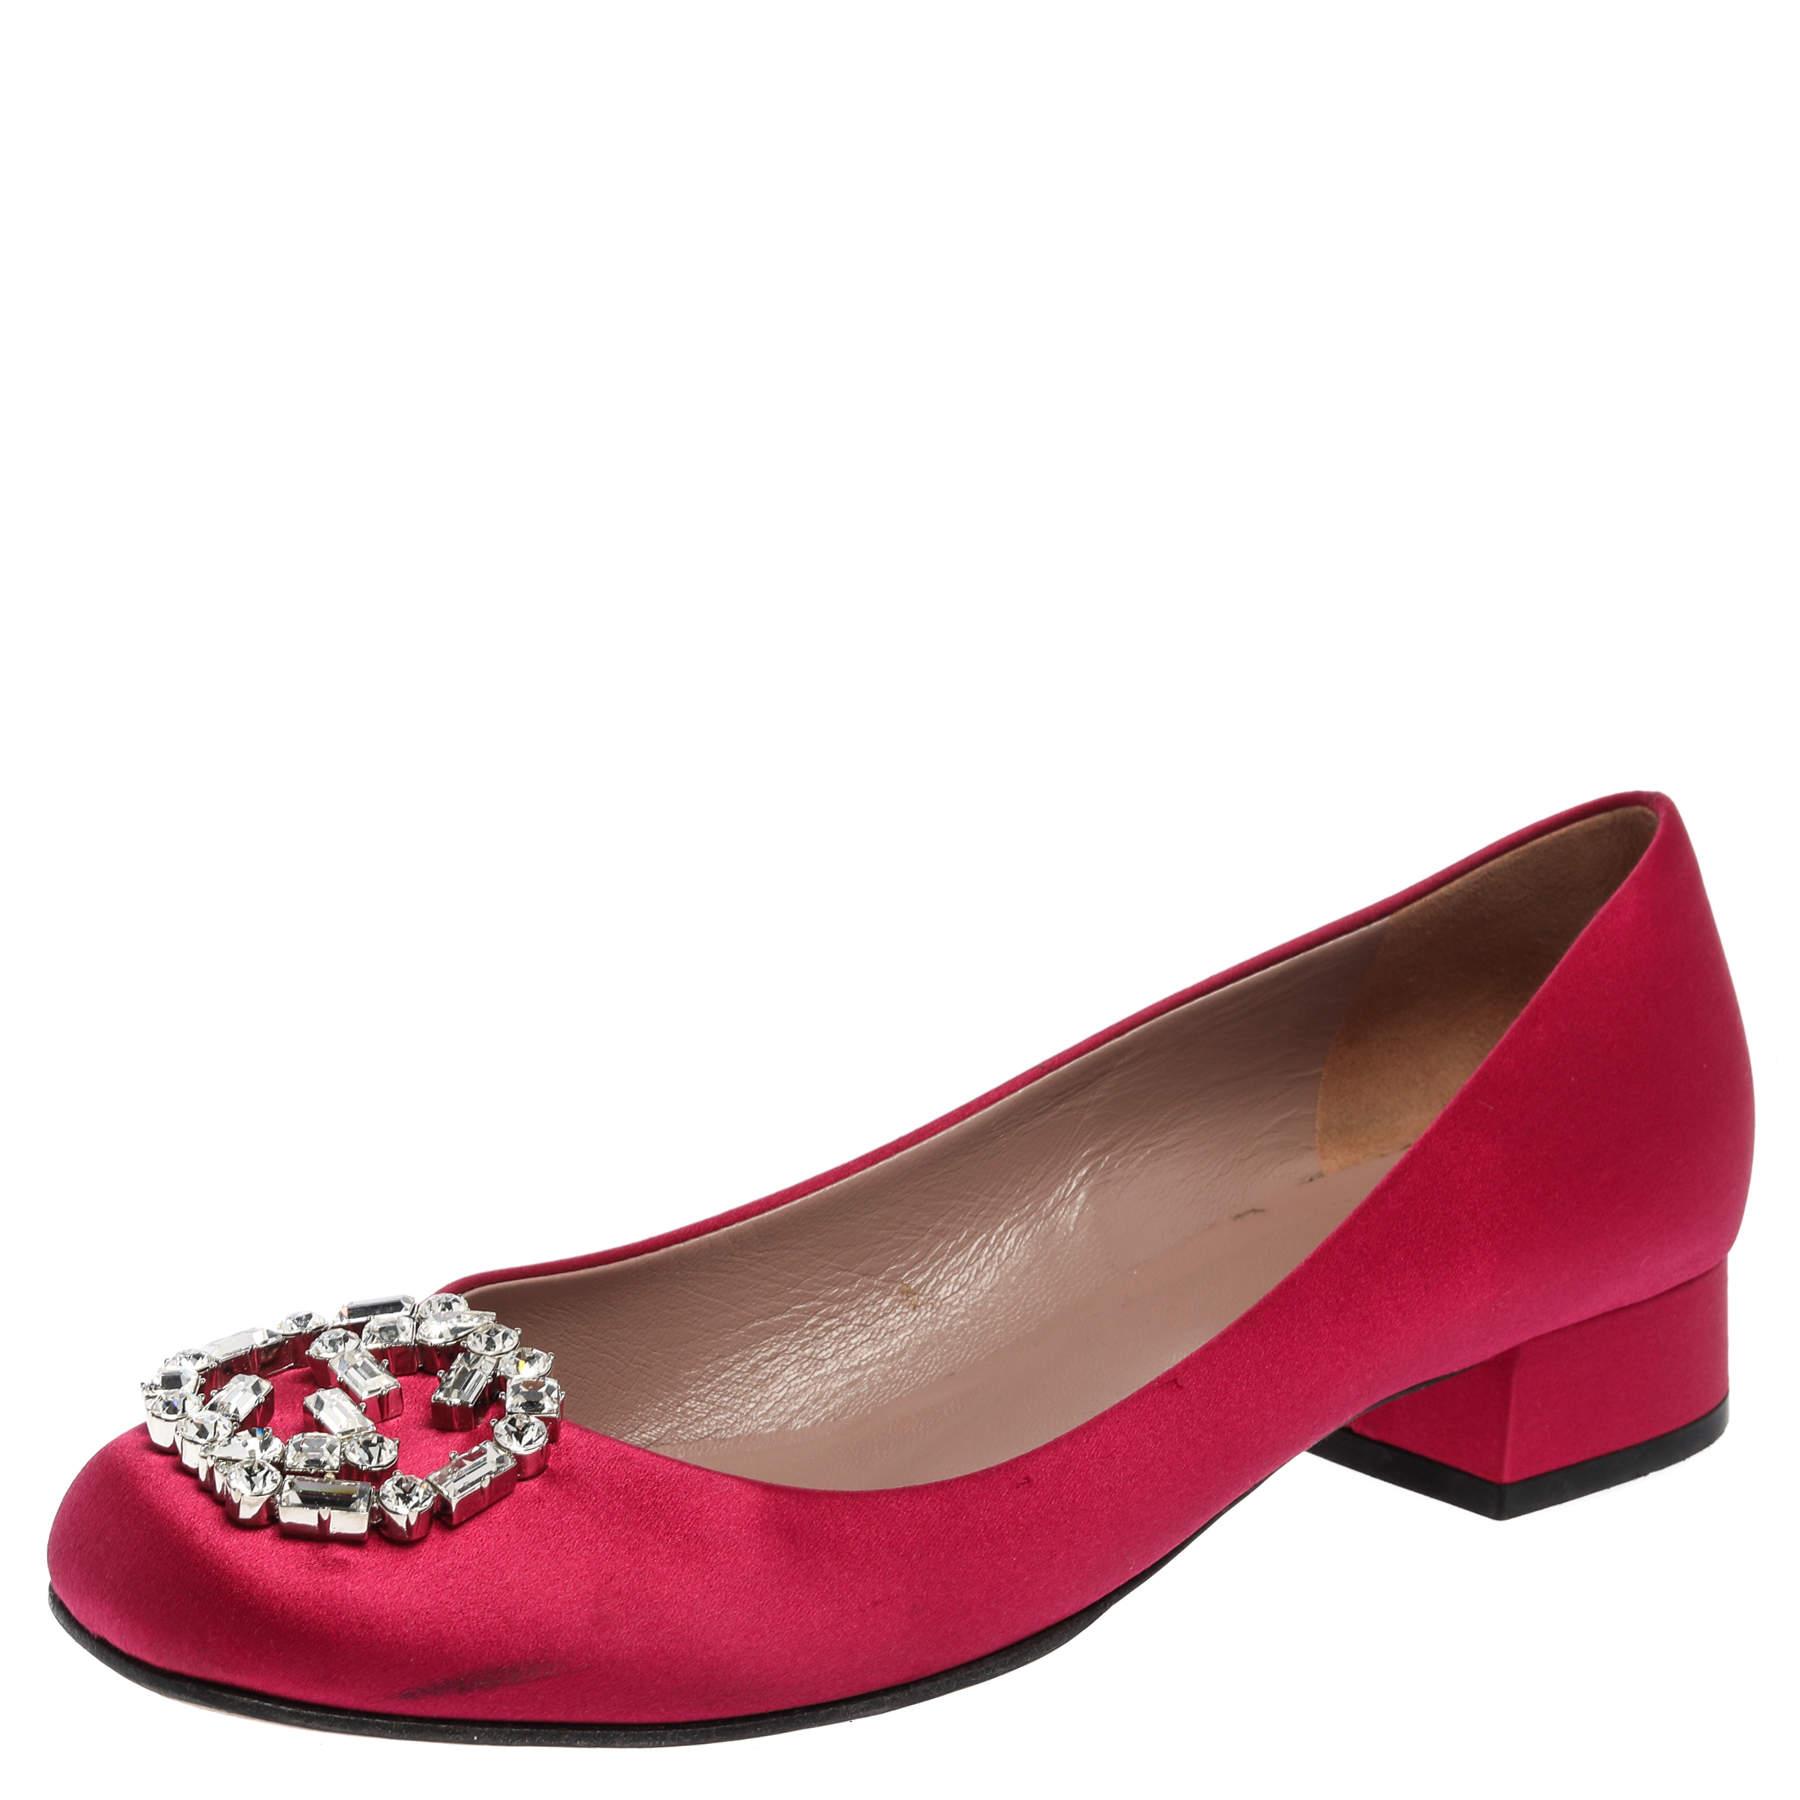 Gucci Pink Satin GG Crystal Embellished Block Heel Pumps Size 37.5